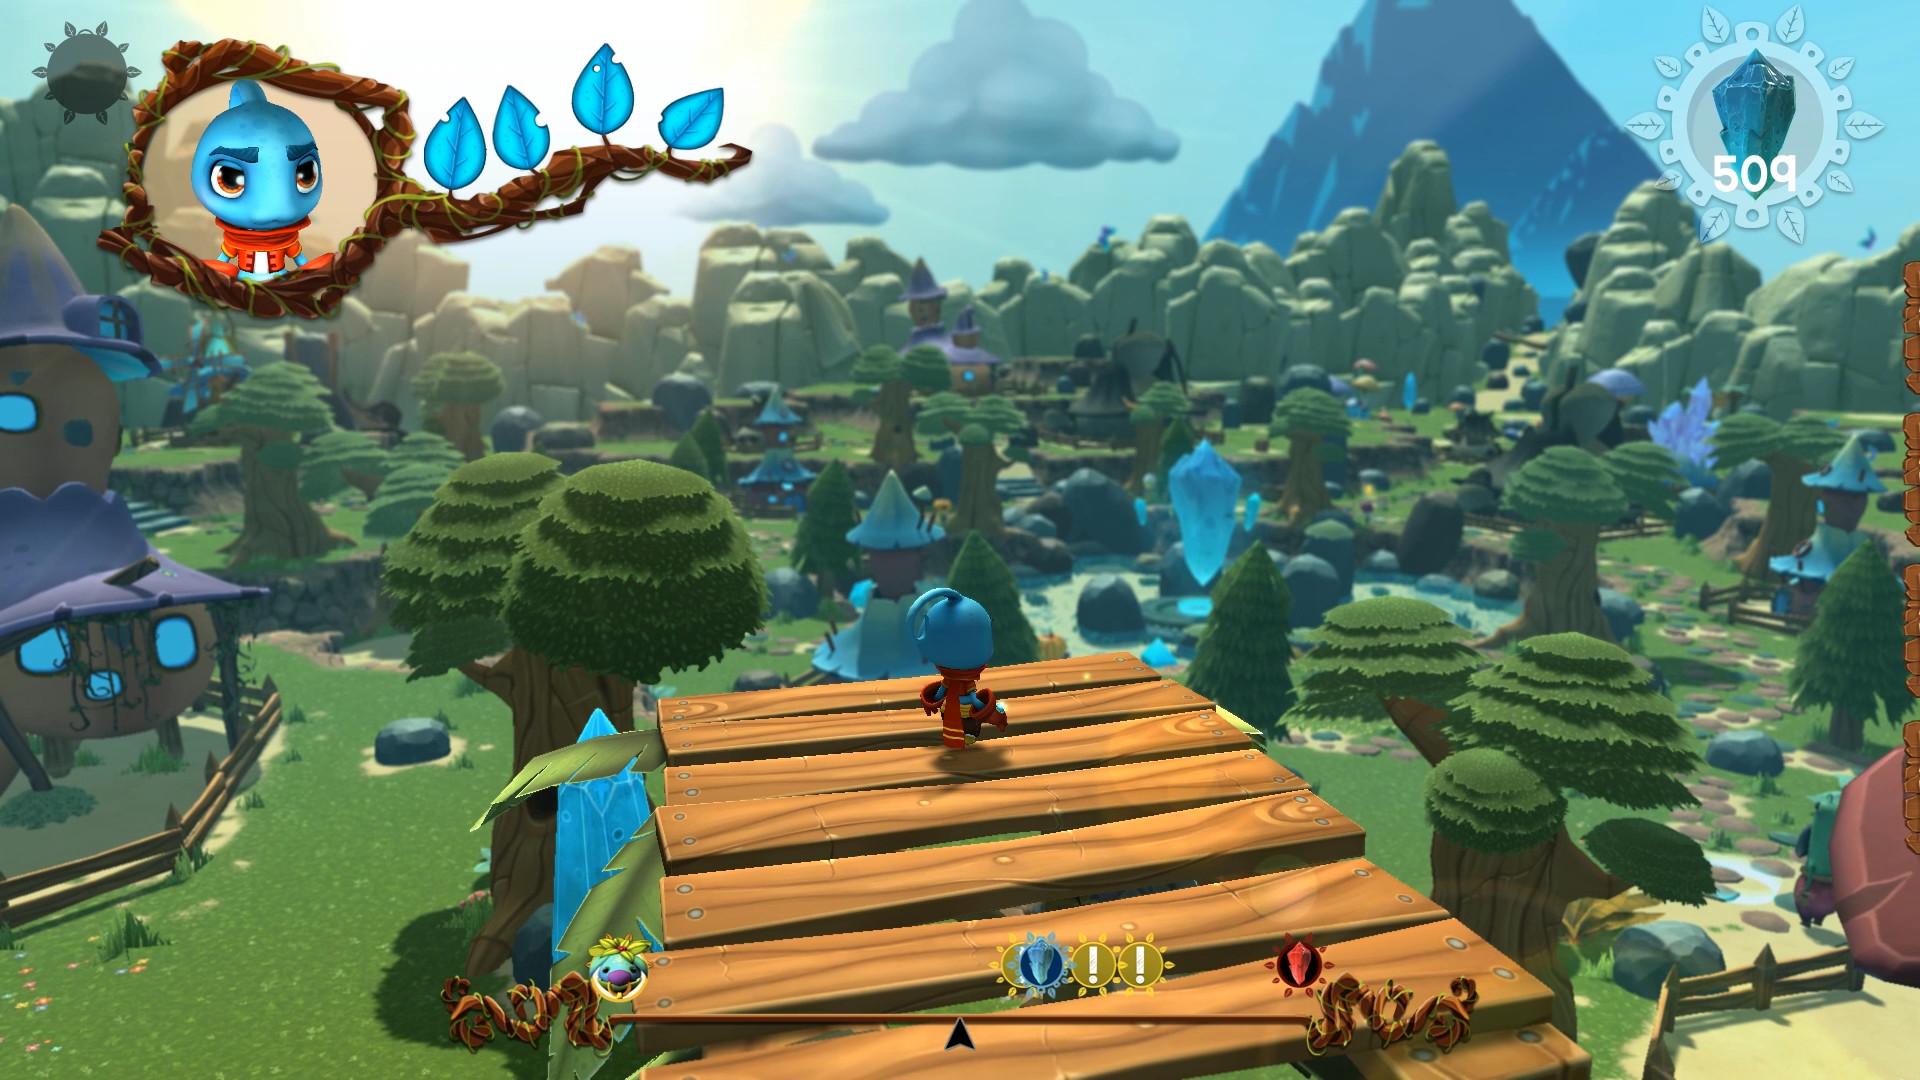 Ginger: Beyond the Crystal Screenshot 1